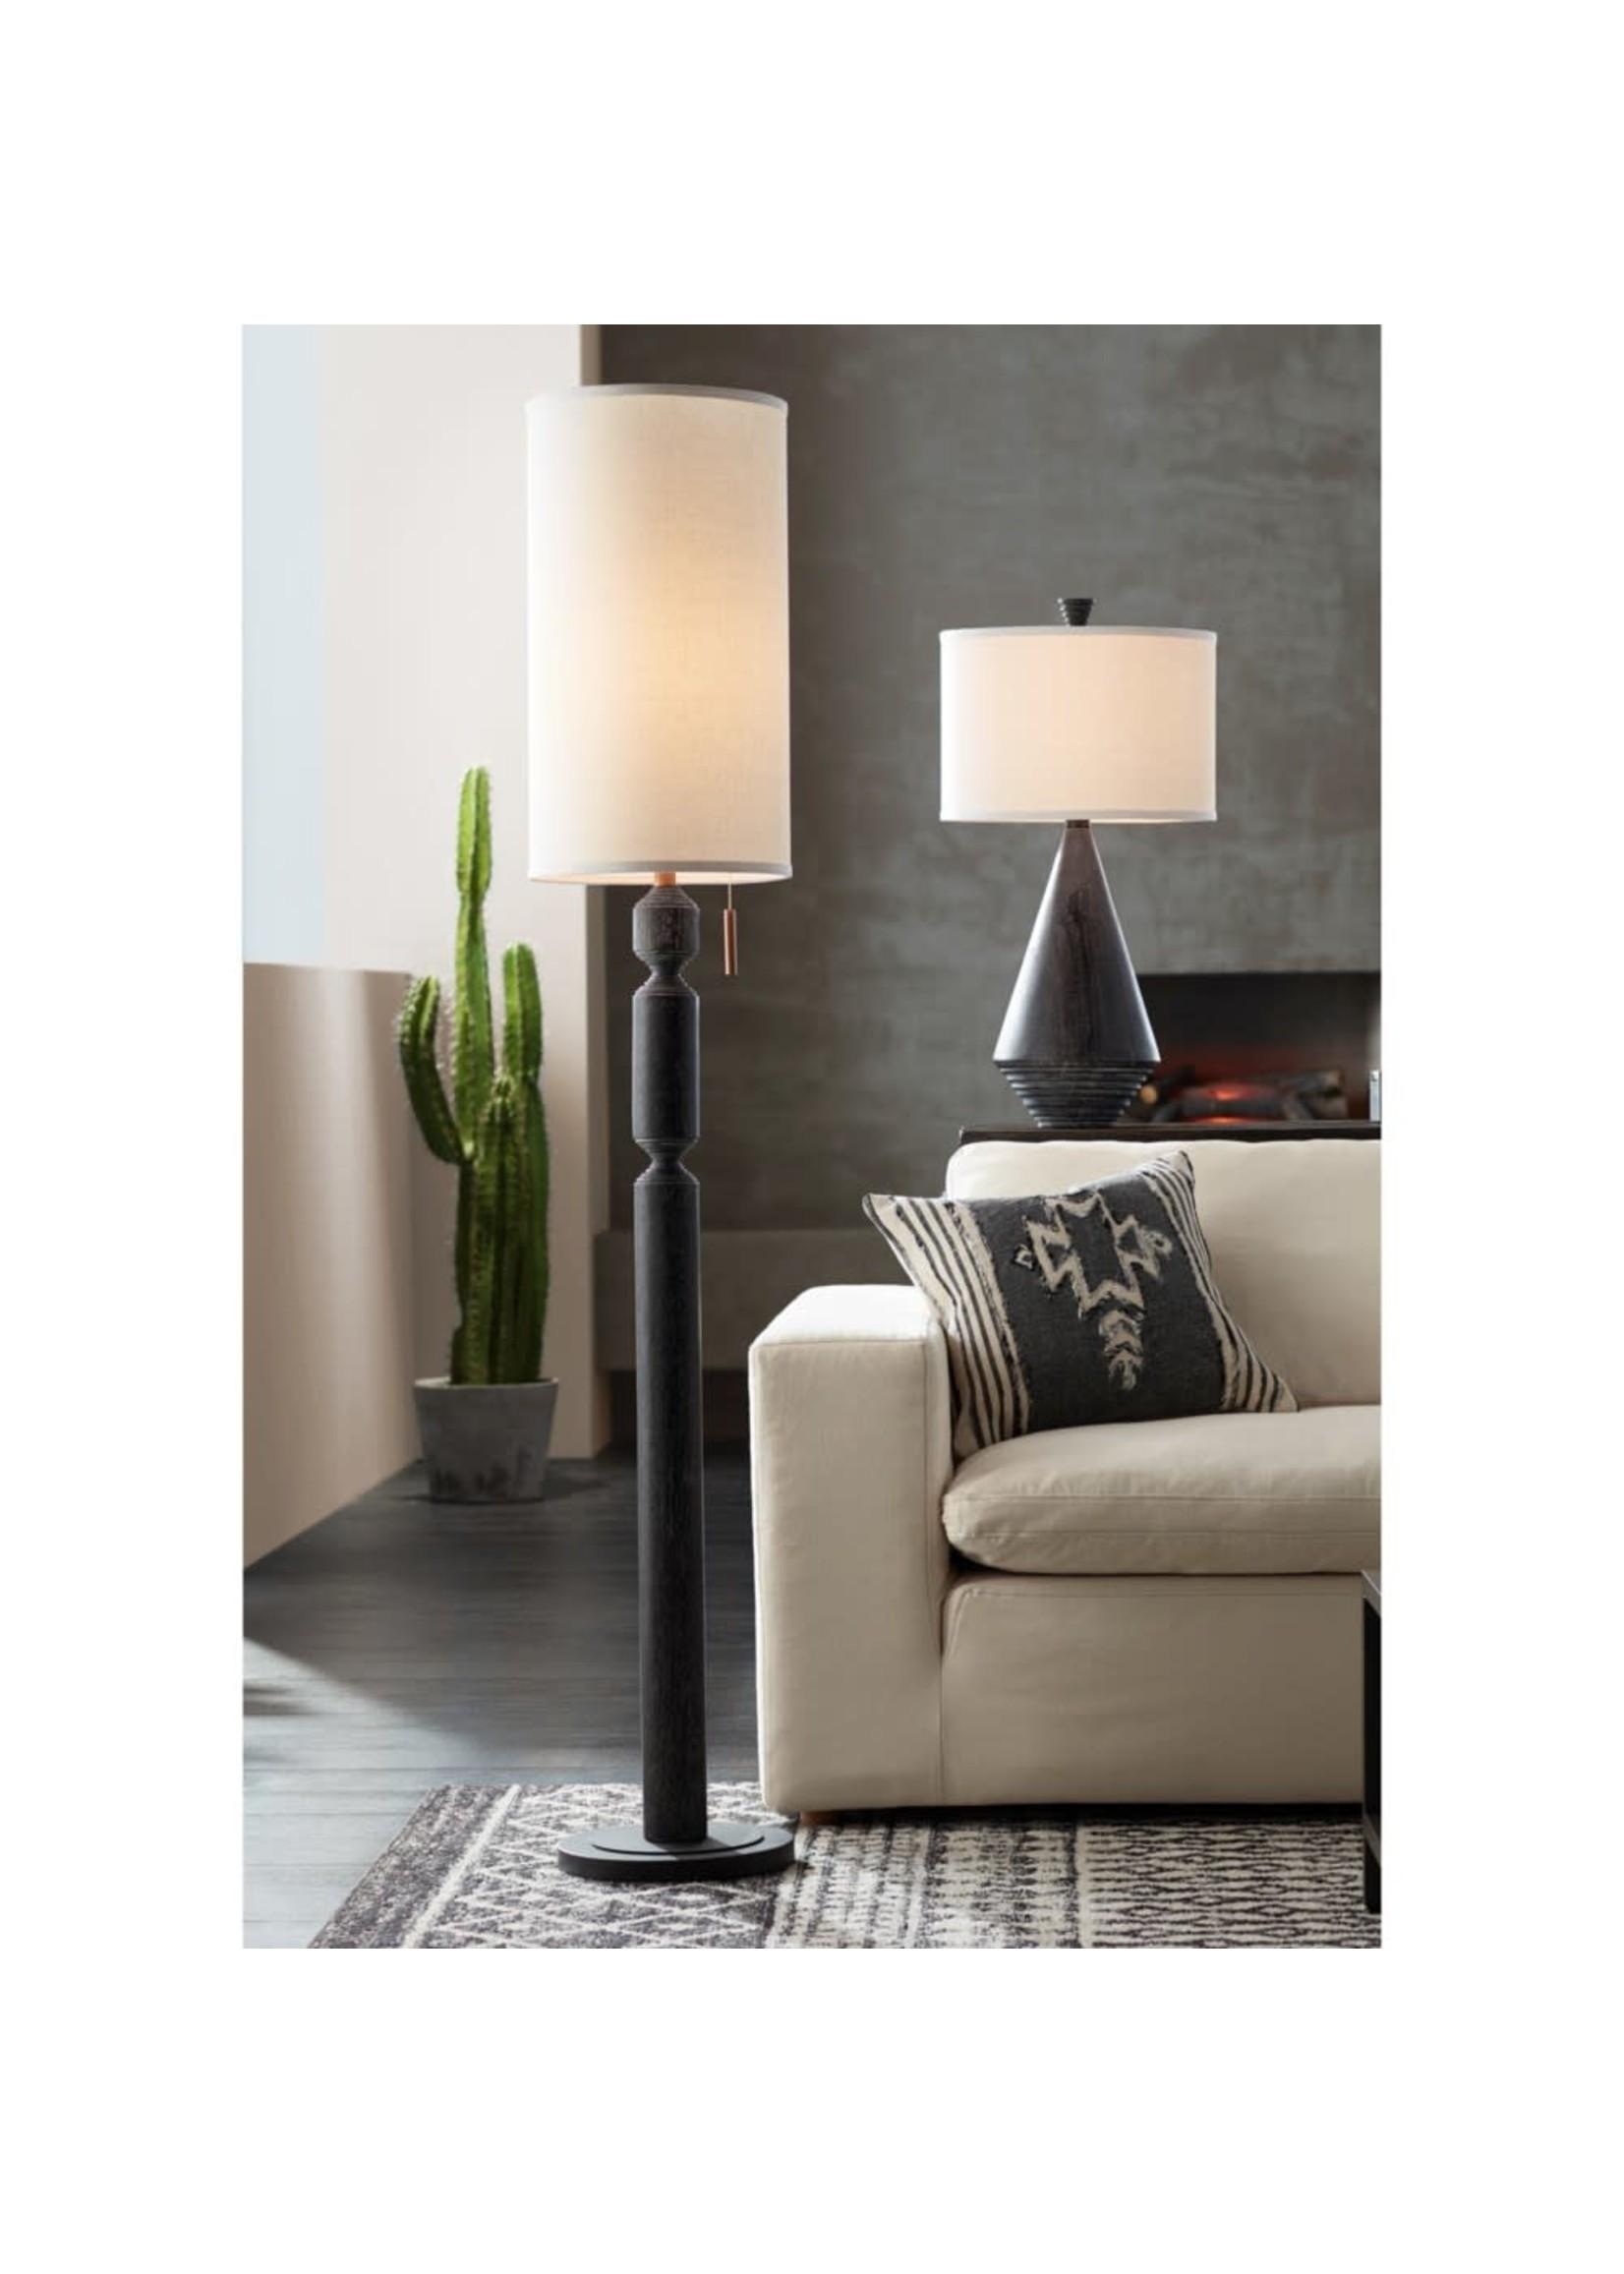 ADELIS FLOOR LAMP